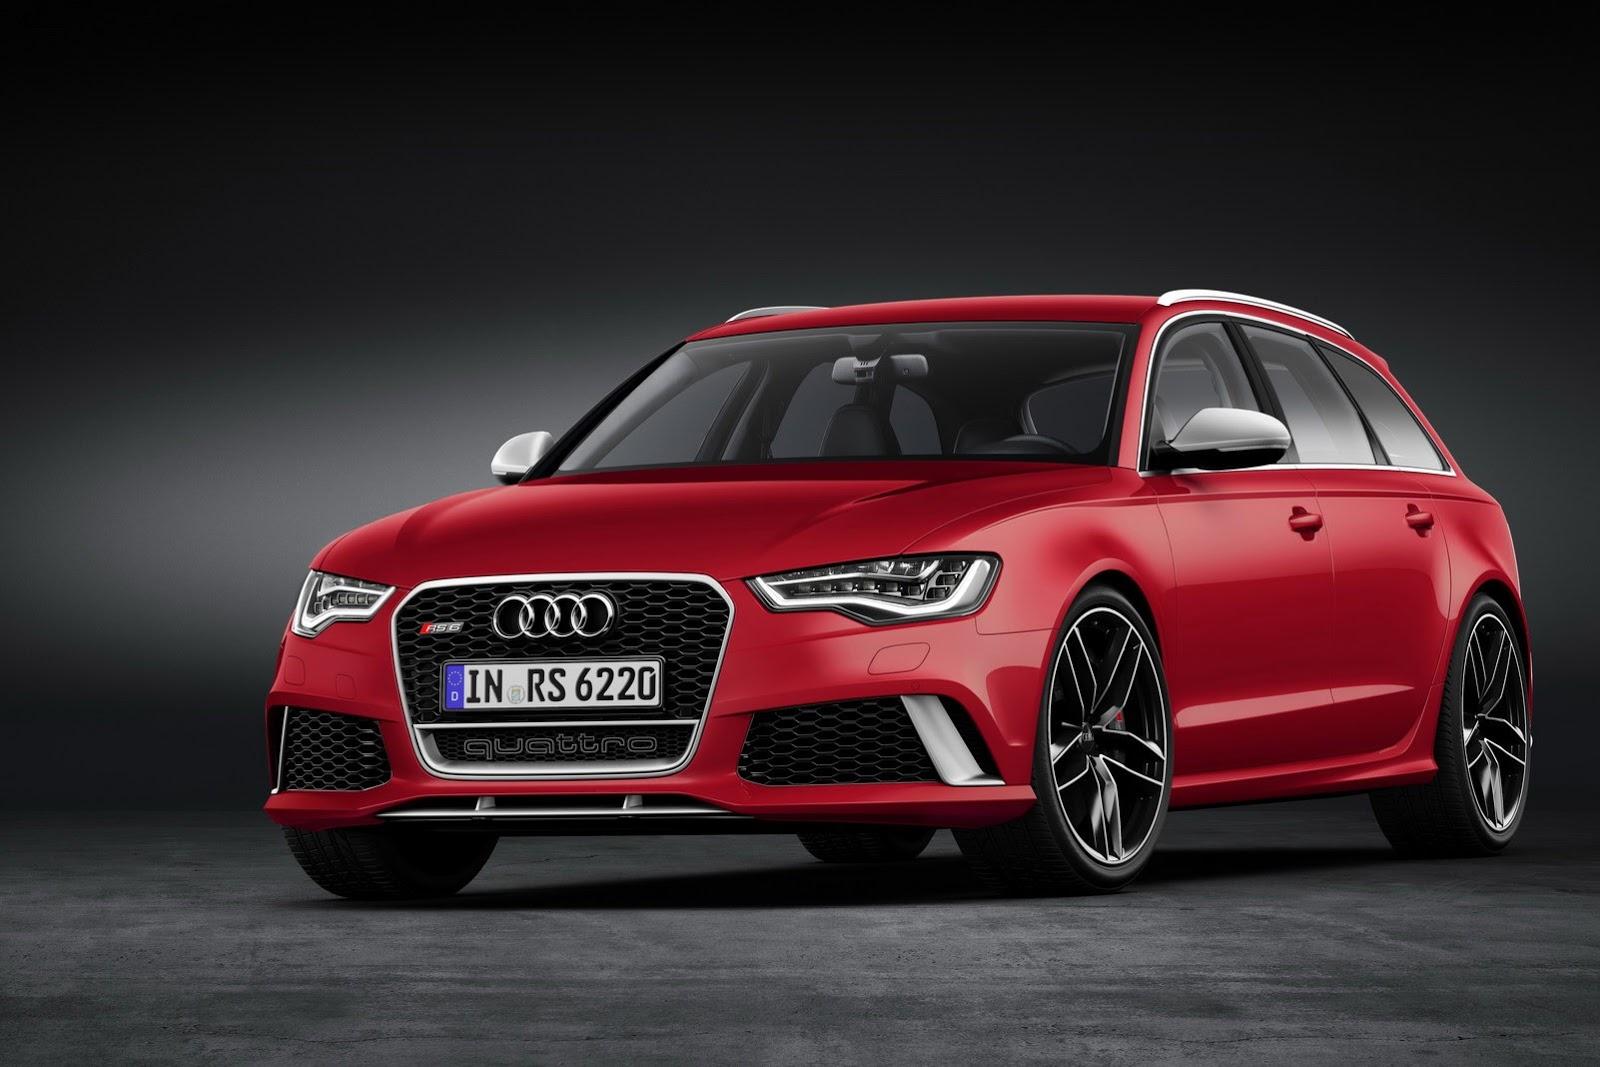 2014 Audi RS6 Avant Front 7/8 Angle